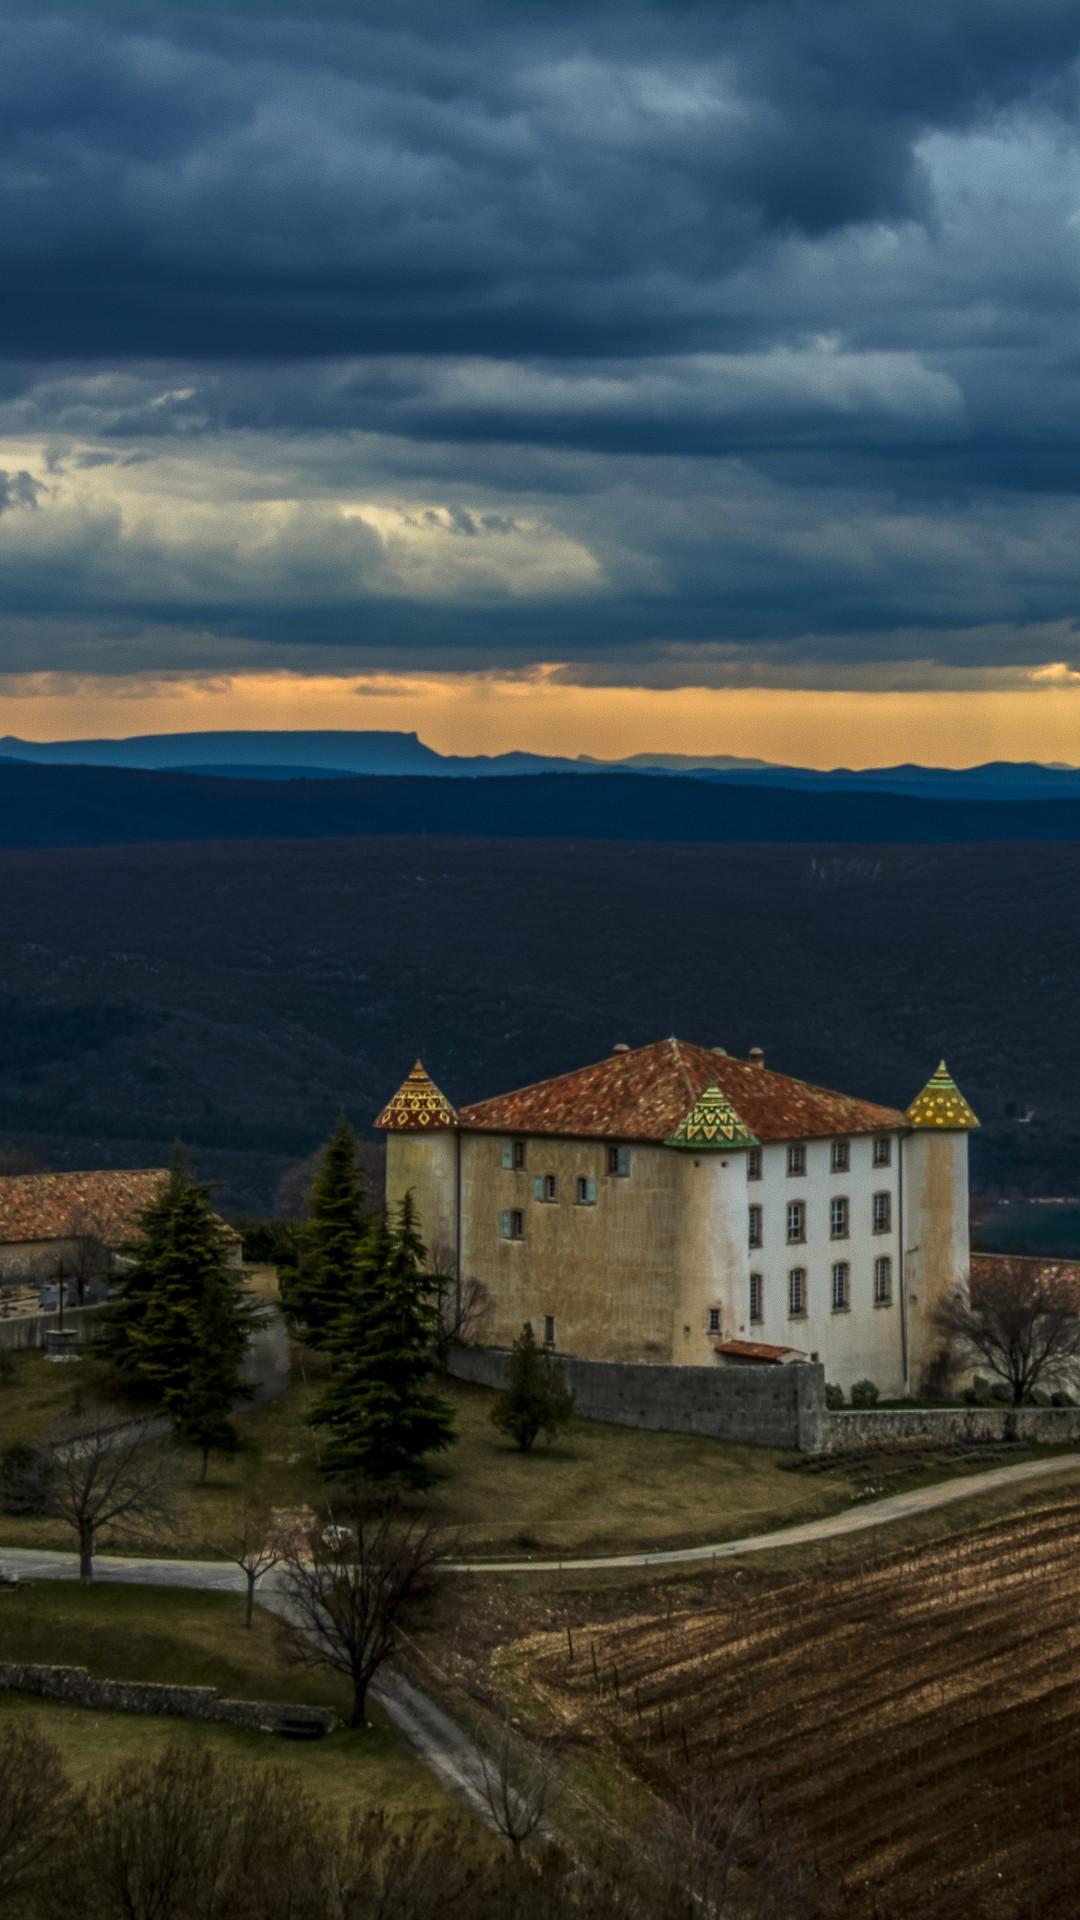 Bmw Mountain View >> Wallpaper Chateau Aiguines, 5k, 4k wallpaper, 8k, France, mountains, sunset, castle, Nature #6148